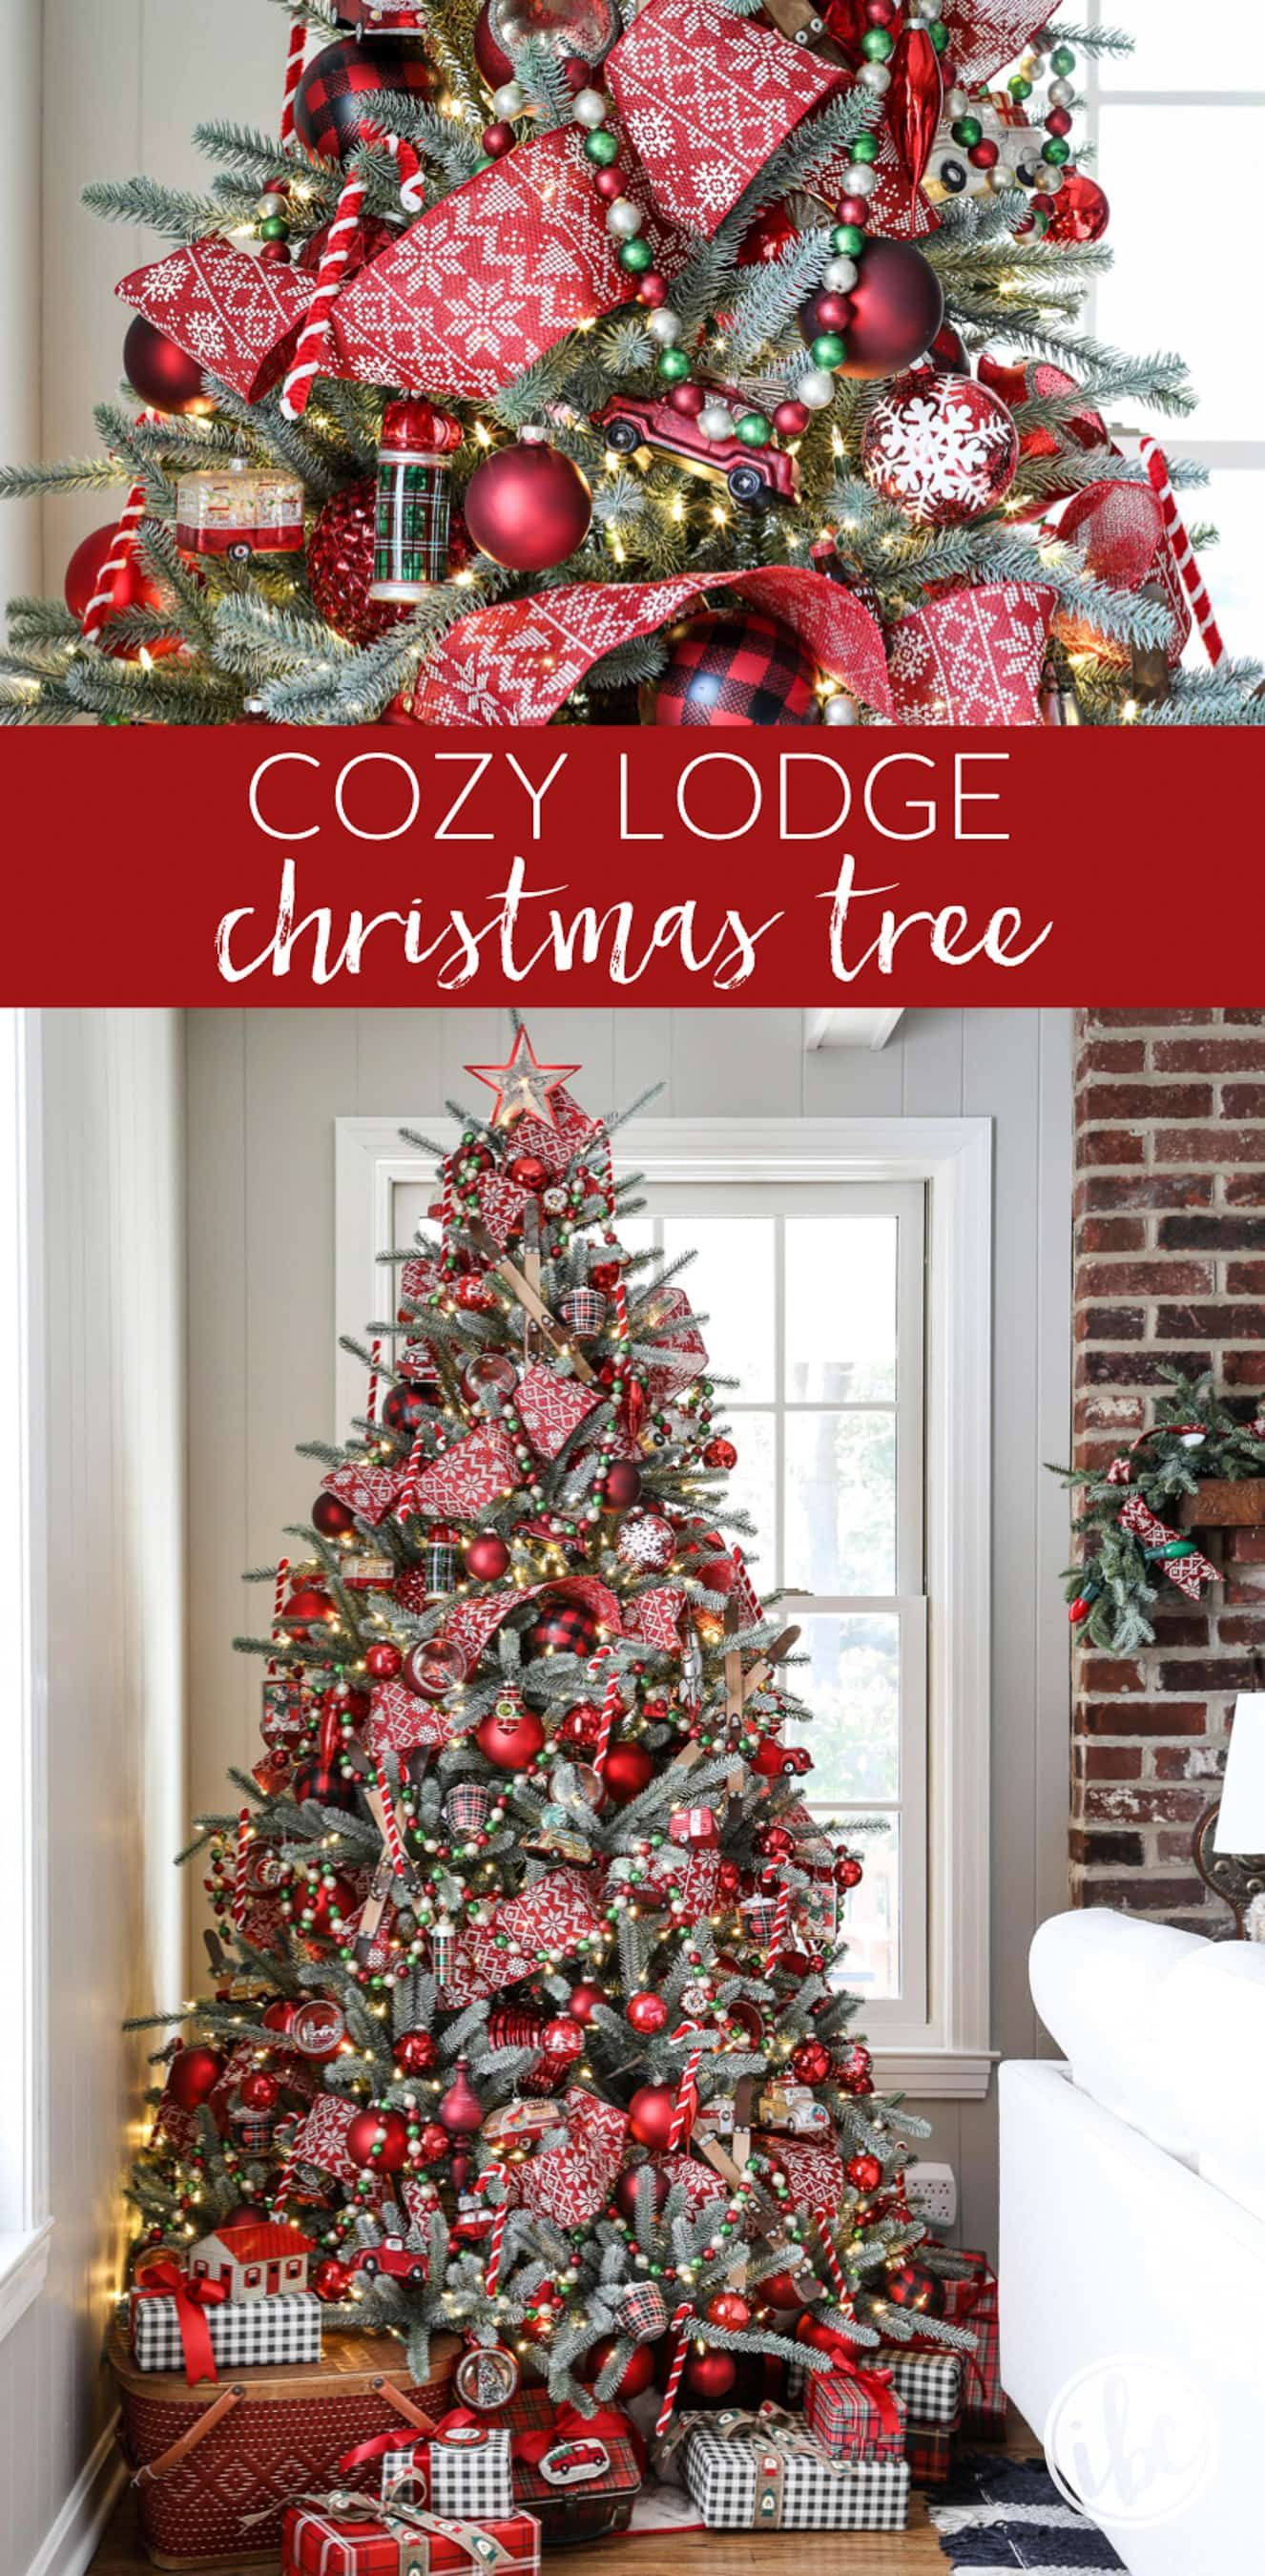 Ideas For Cozy Lodge Christmas Tree Decorations Christmastree Decor Holiday Decorations Christma Christmas Lodge Christmas Tree Christmas Tree Decorations